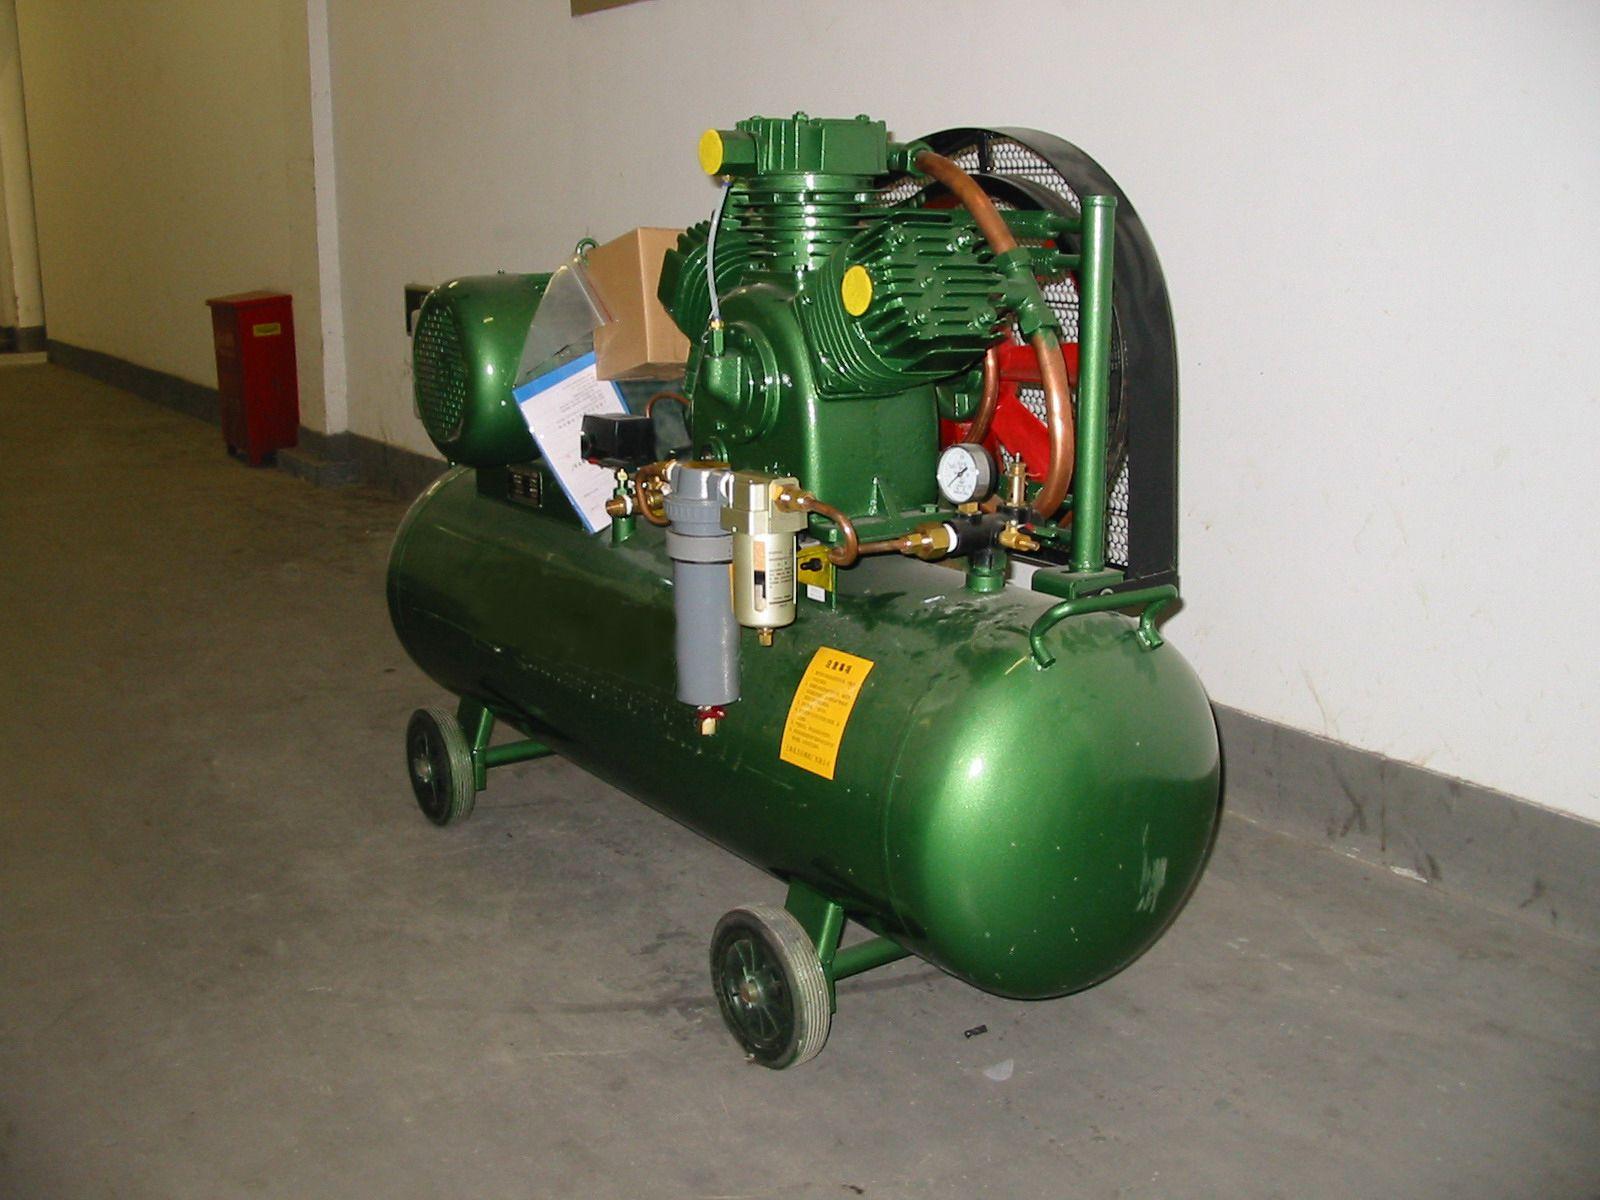 W-0.6/60空氣壓縮機 0.6m?/min 6MPA